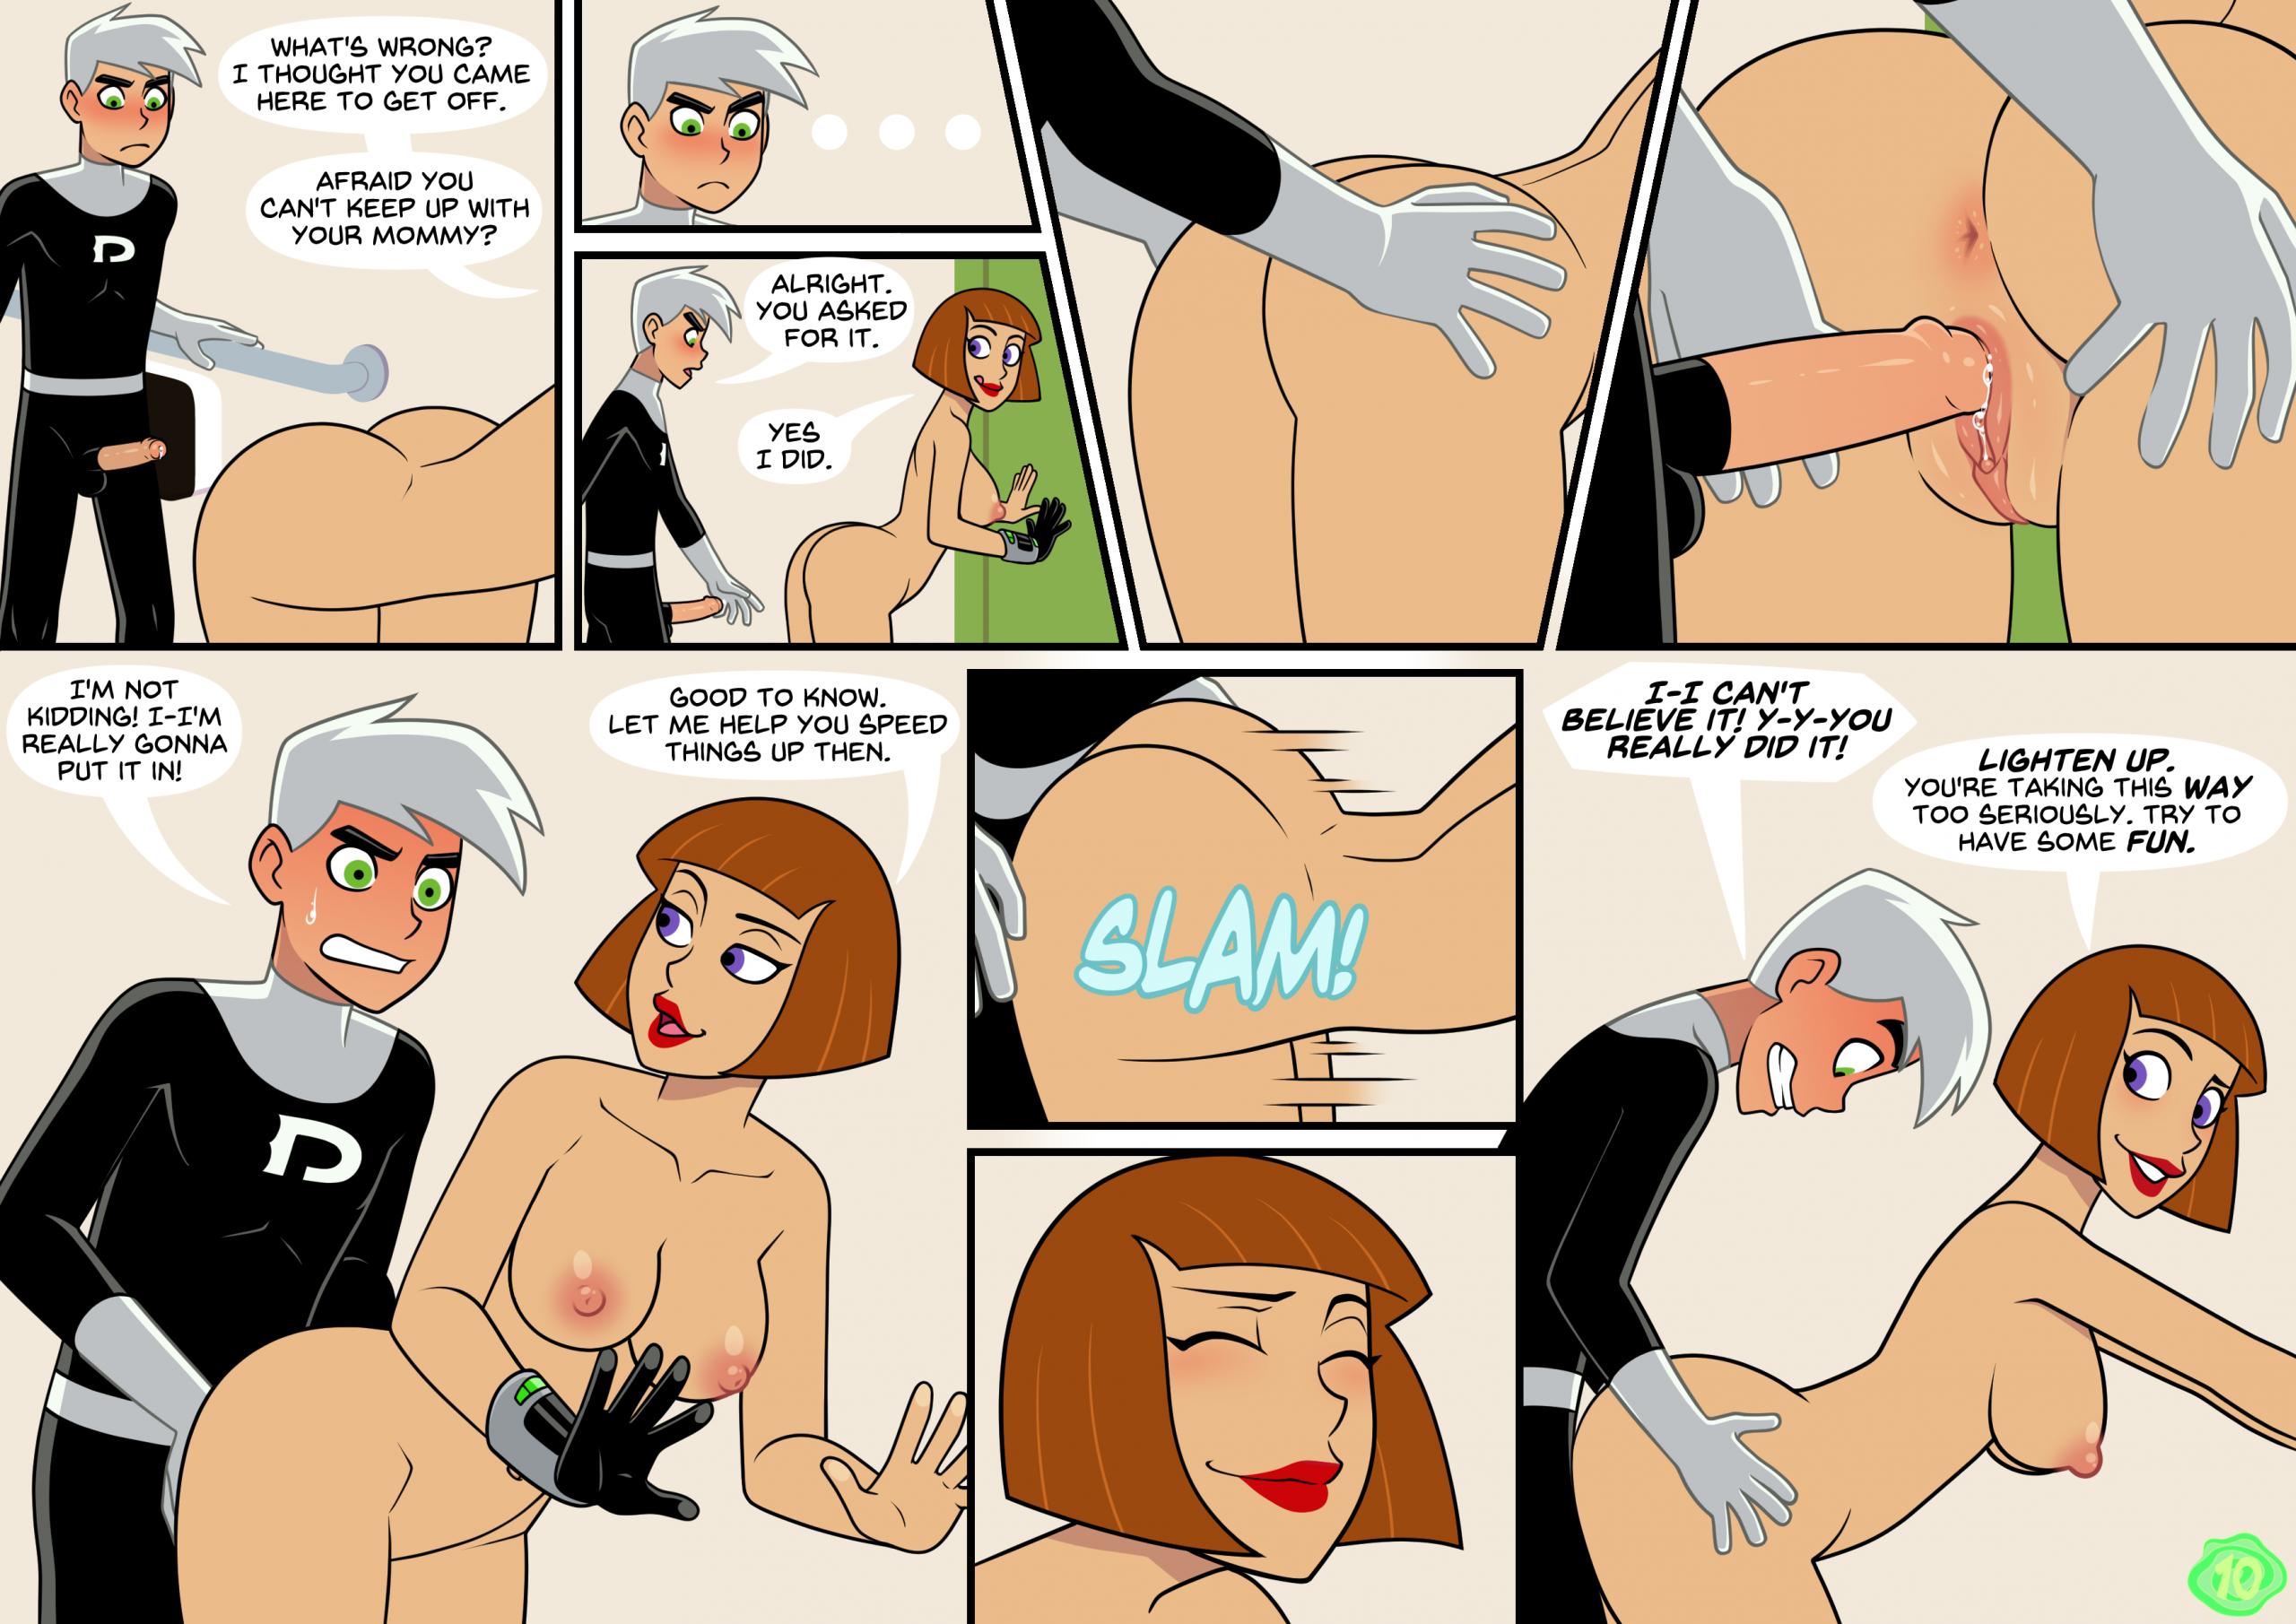 Glory Haunt porn comics Oral sex, Blowjob, Creampie, Cum Swallow, cunnilingus, incest, Lolicon, Masturbation, MILF, Sci-Fi, Straight, Straight Shota, X-Ray